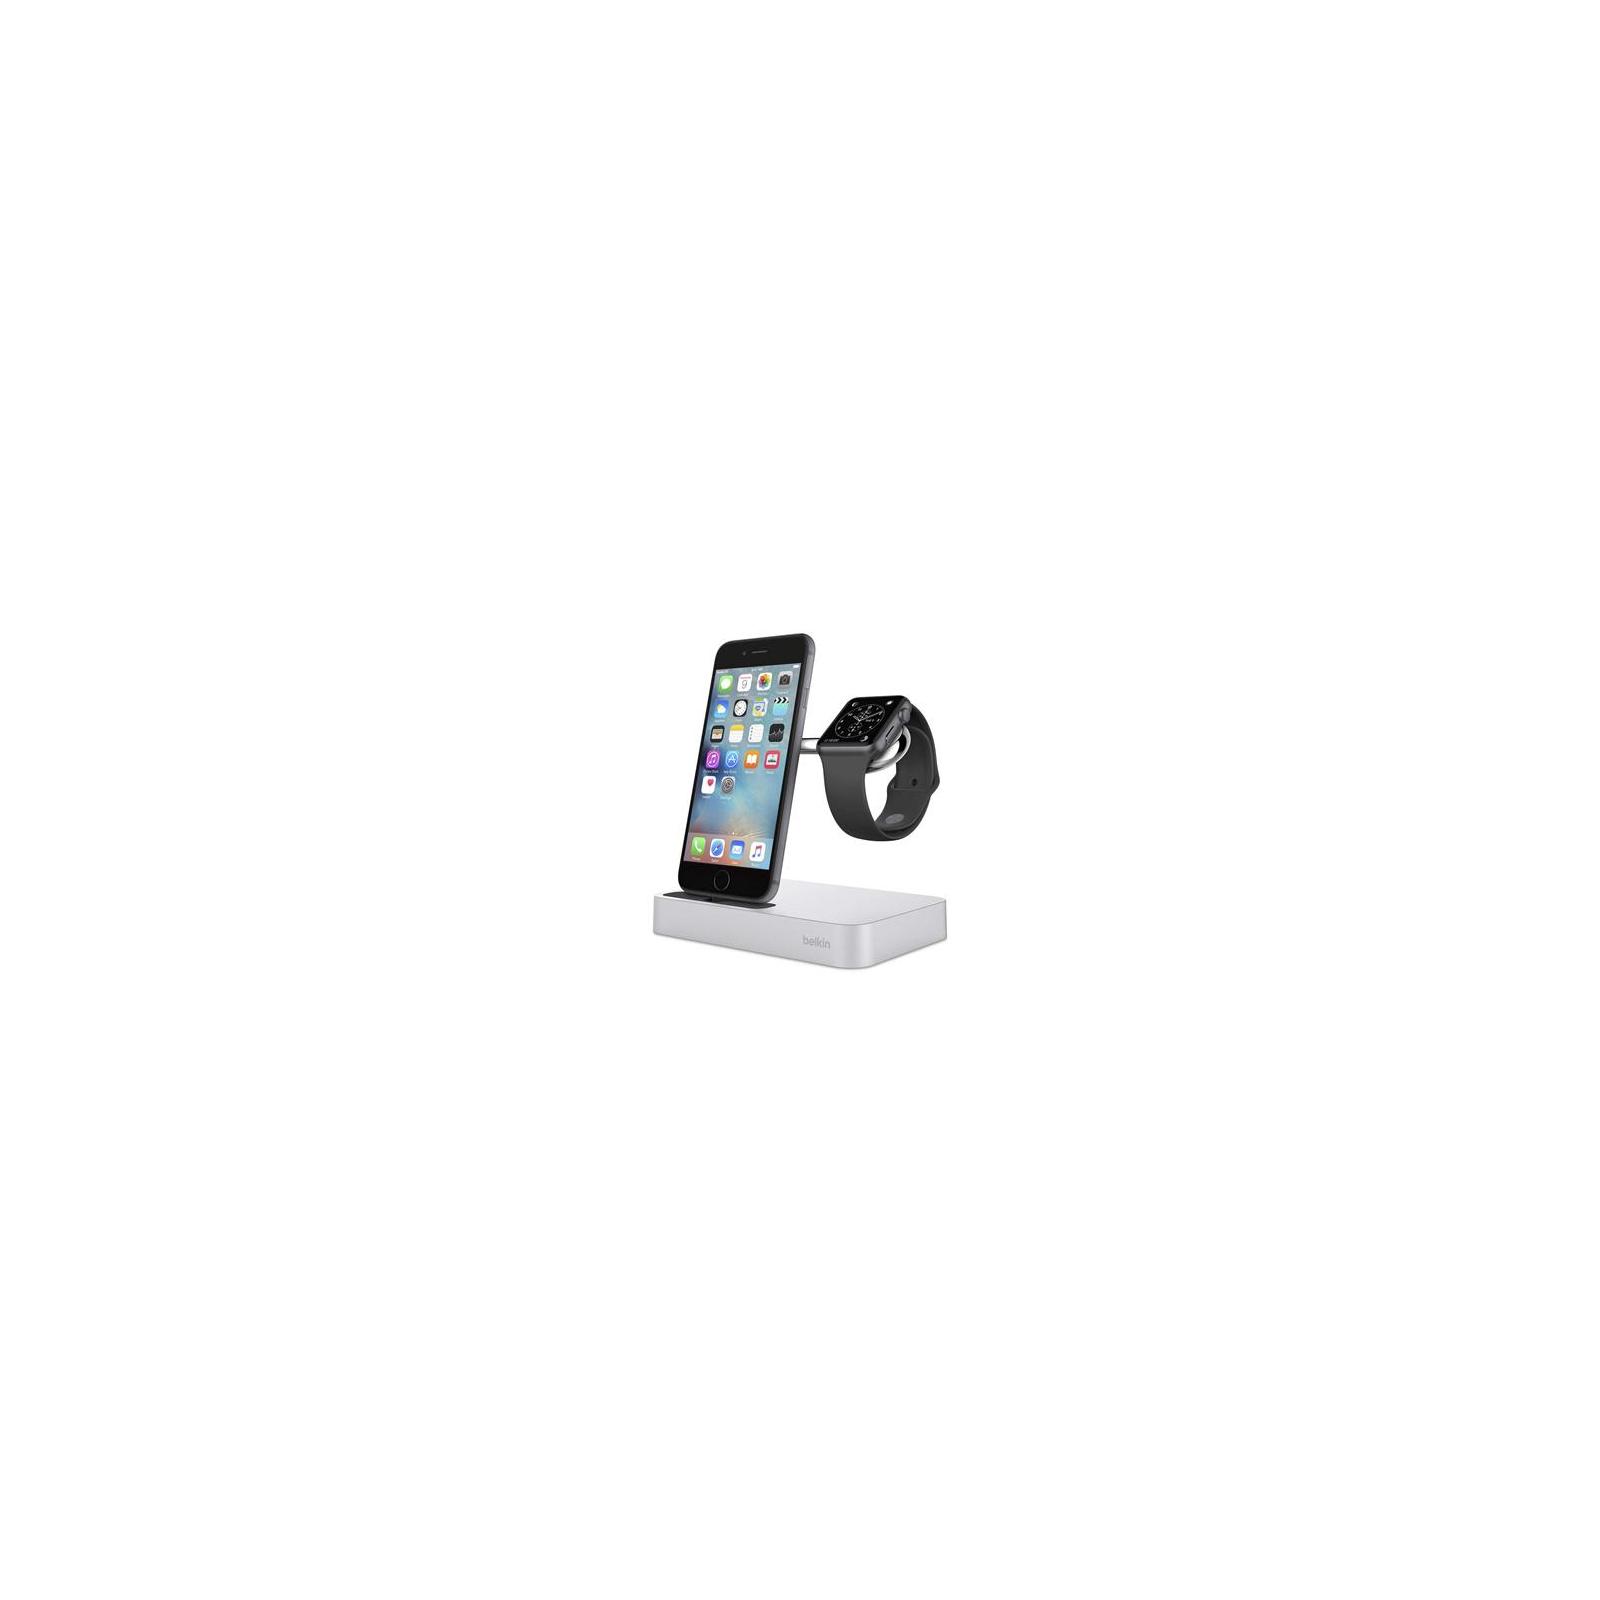 Док-станция Belkin Charge Dock iWatch + iPhone, silver (F8J183vfSLV) изображение 3